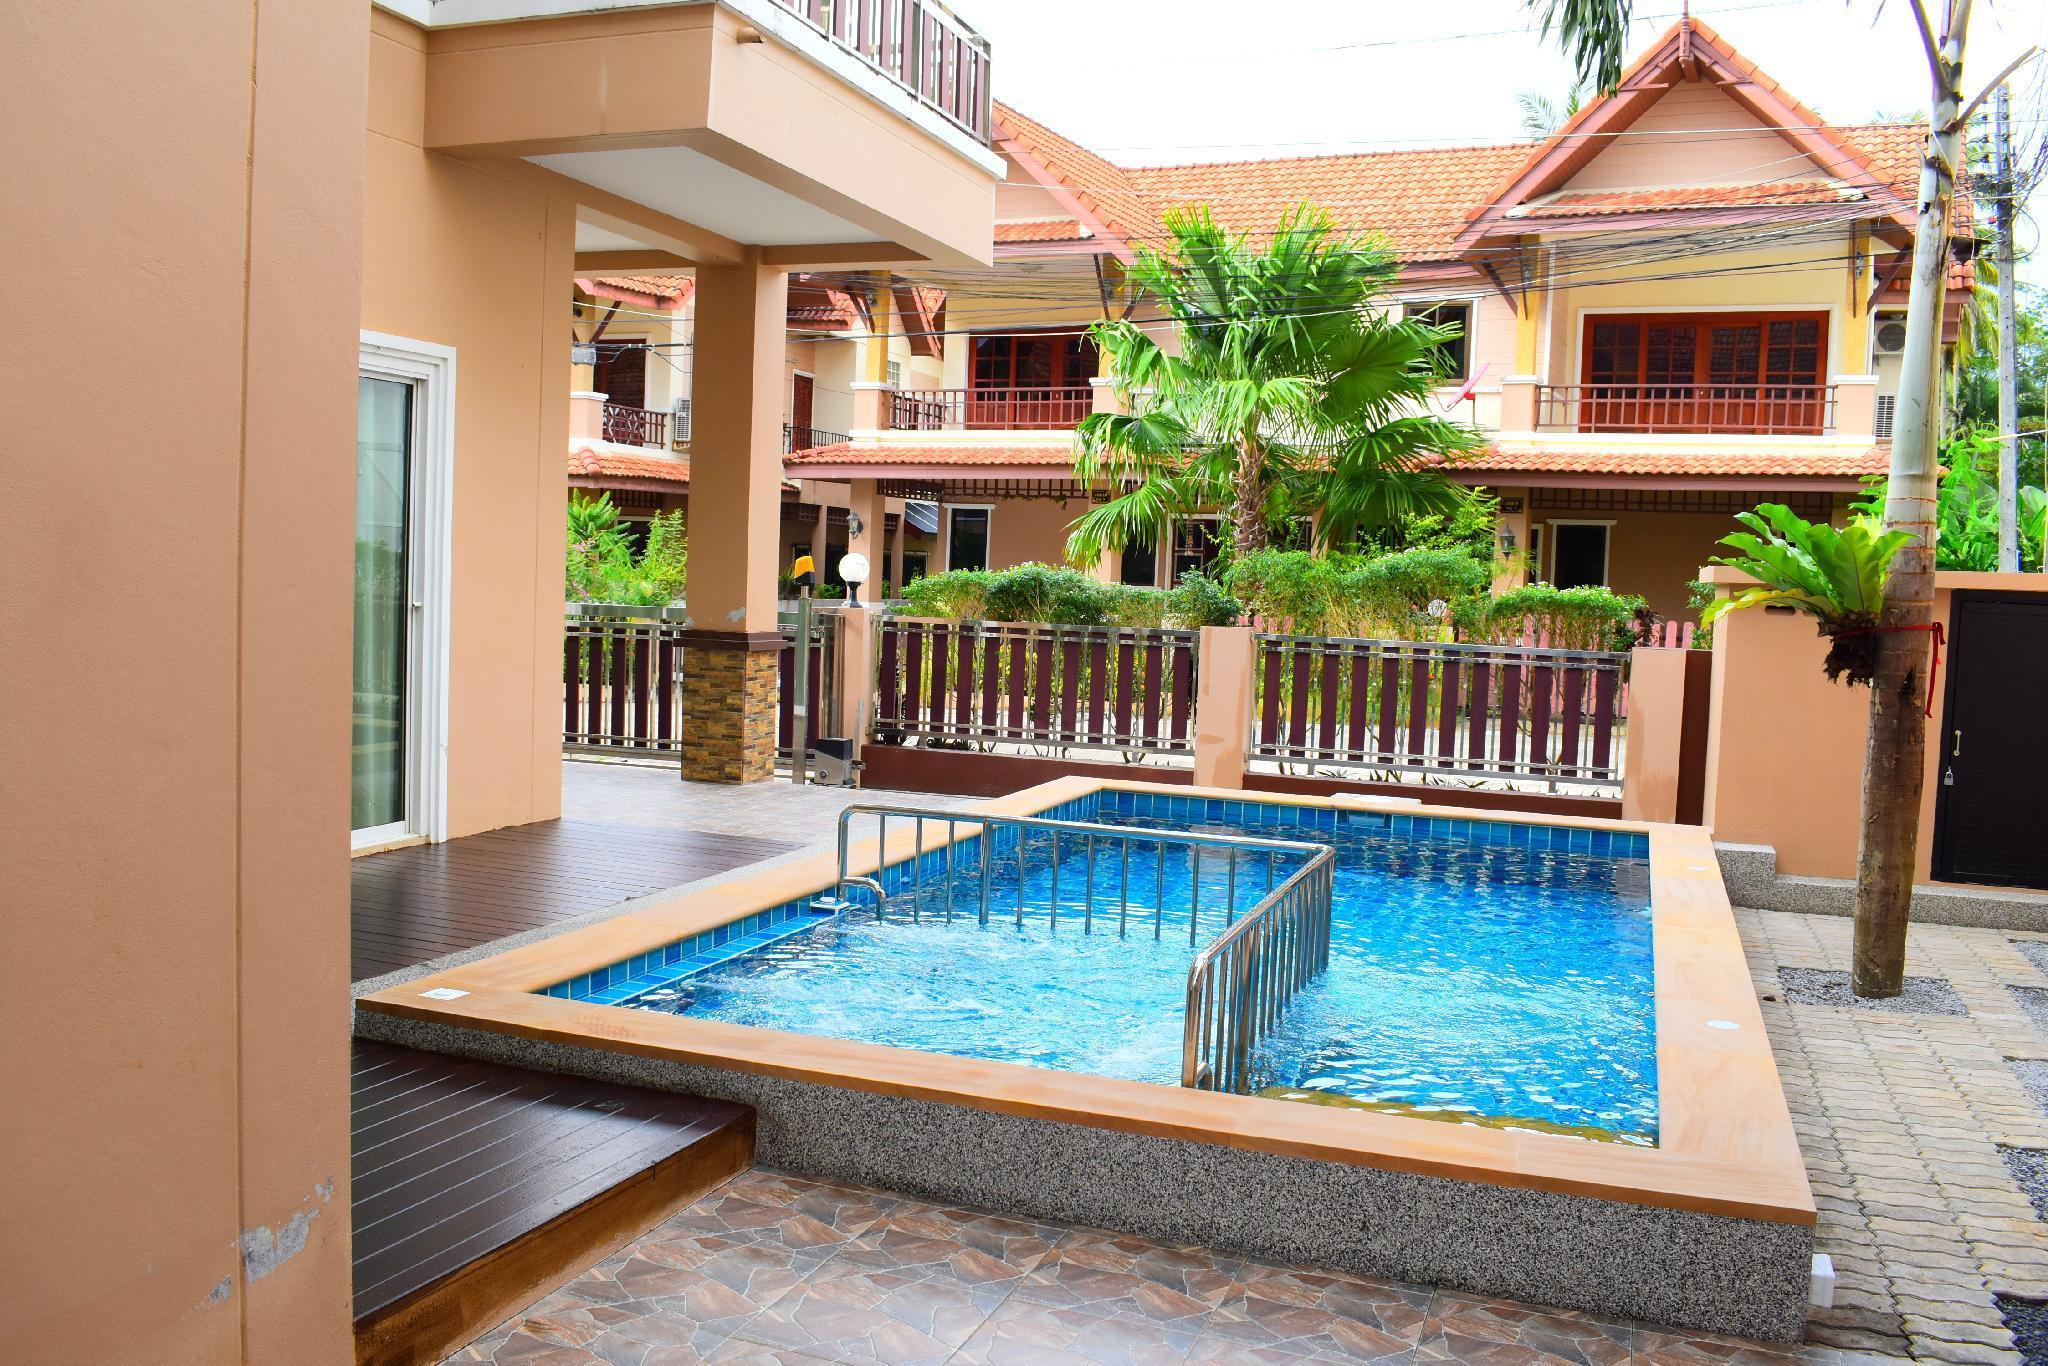 Poonsiri Private Pool Villa Aonang พูนสิริ ไพรเวท พูล วิลลา อ่างนาง